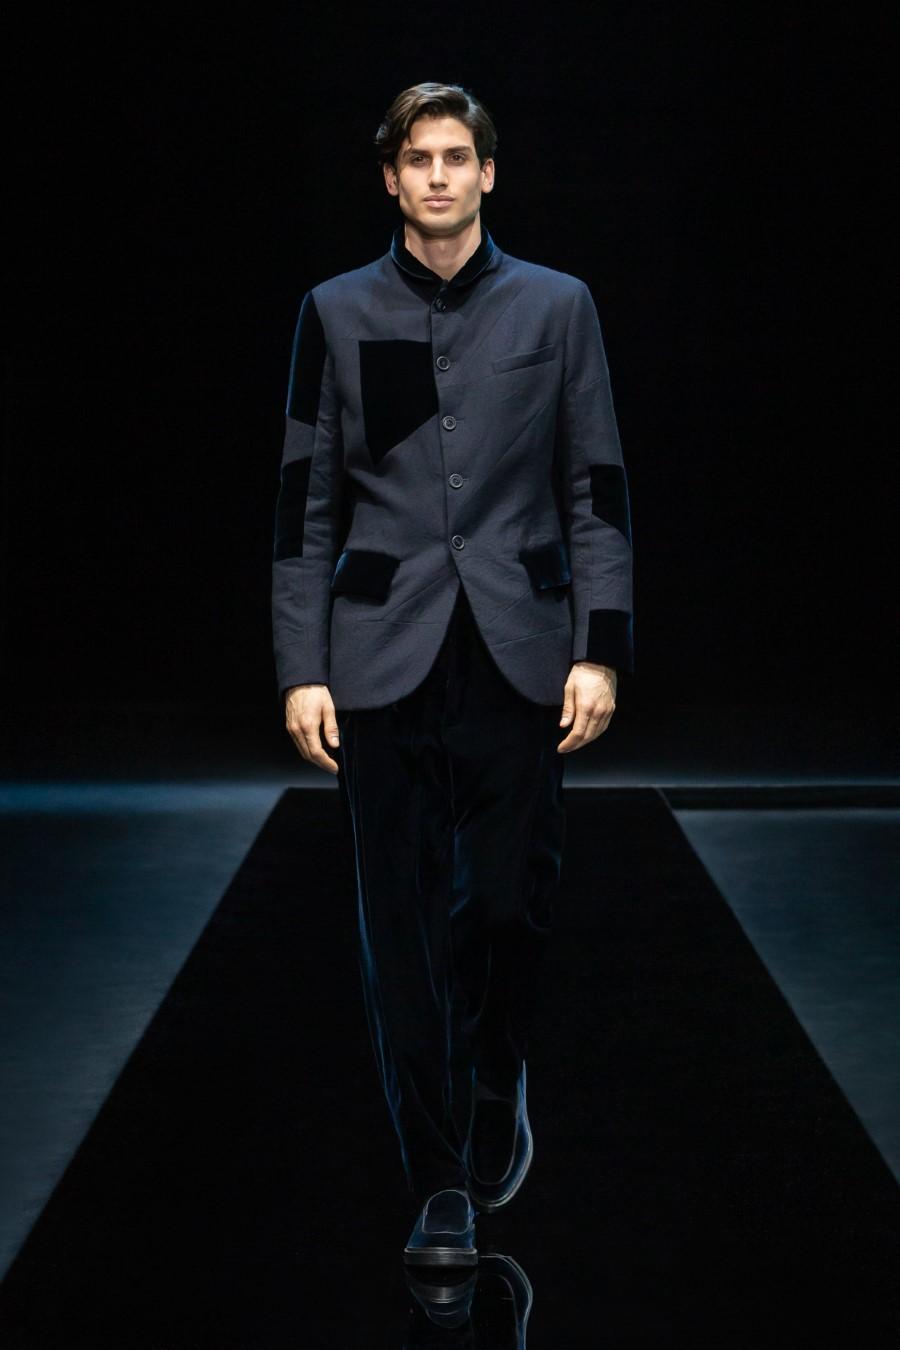 Giorgio Armani Men's Fall Winter 2021 - Milan Fashion WeekGiorgio Armani Men's Fall Winter 2021 - Milan Fashion Week